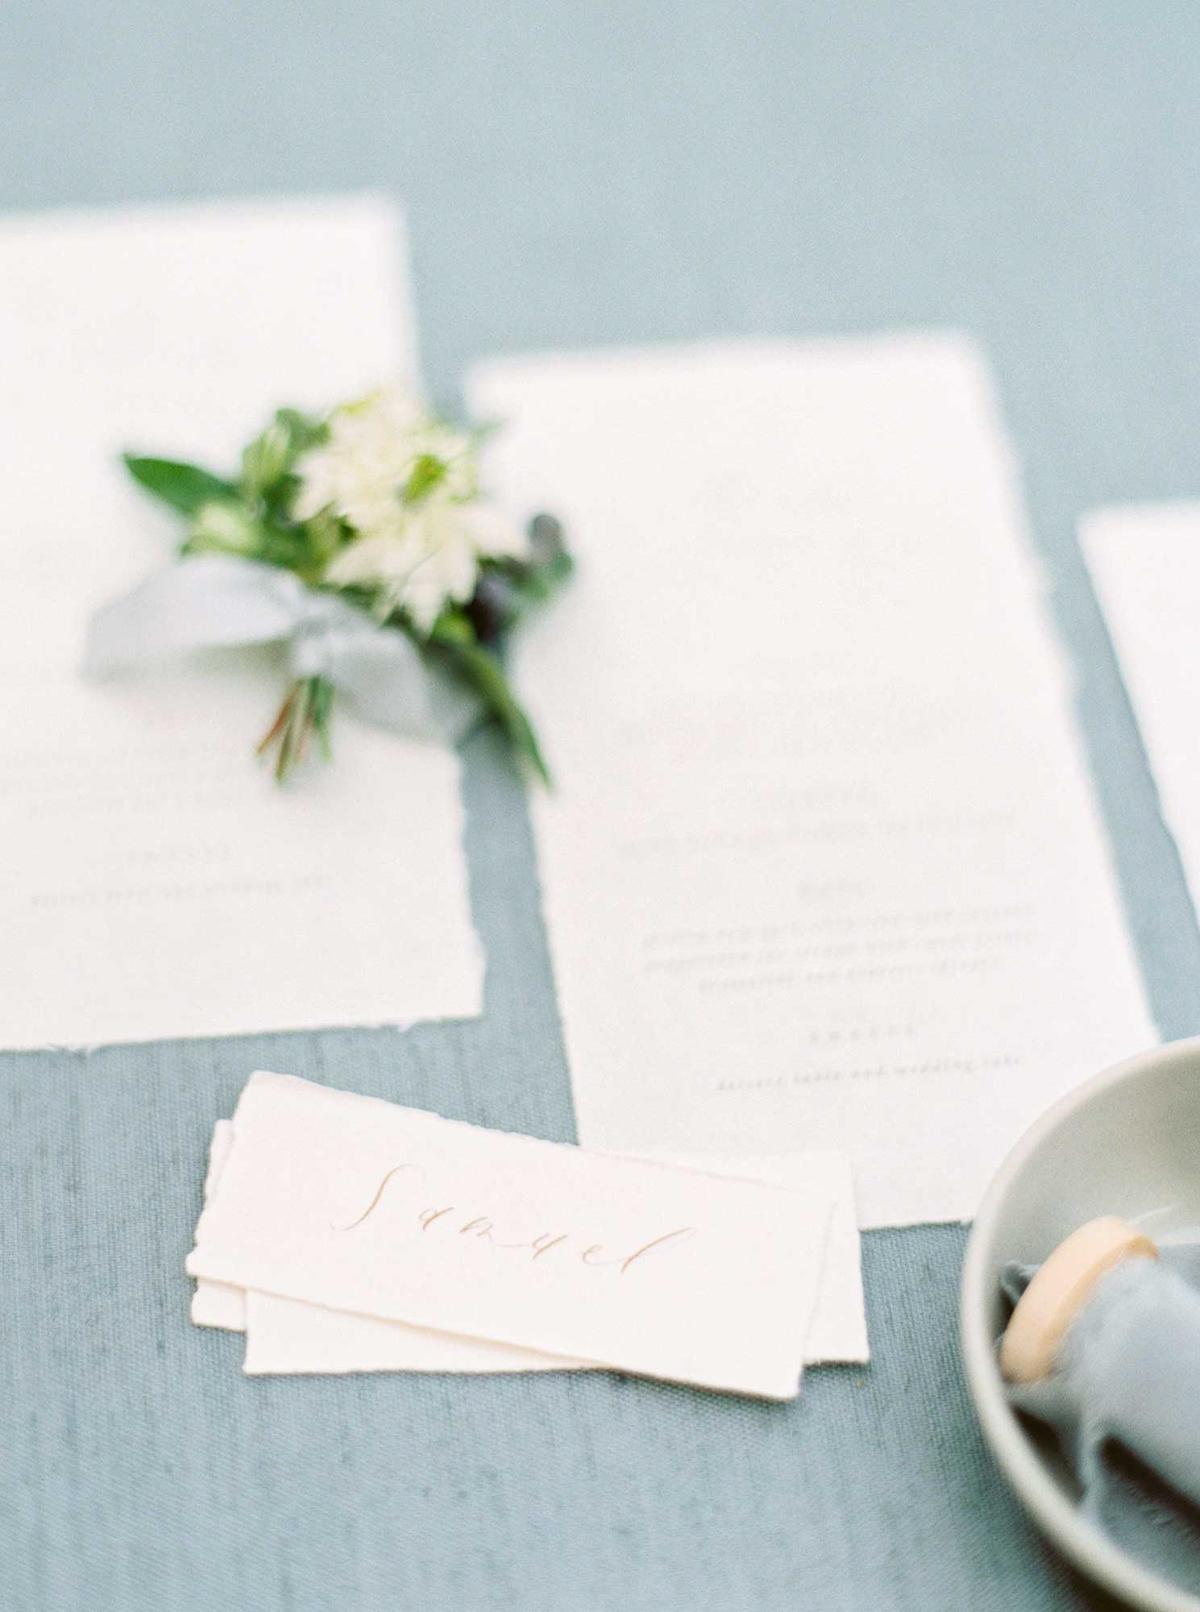 kayla-yestal-vineyard-bride-swish-list-woodland-weddings-niagara-wedding-editorial-16.jpg